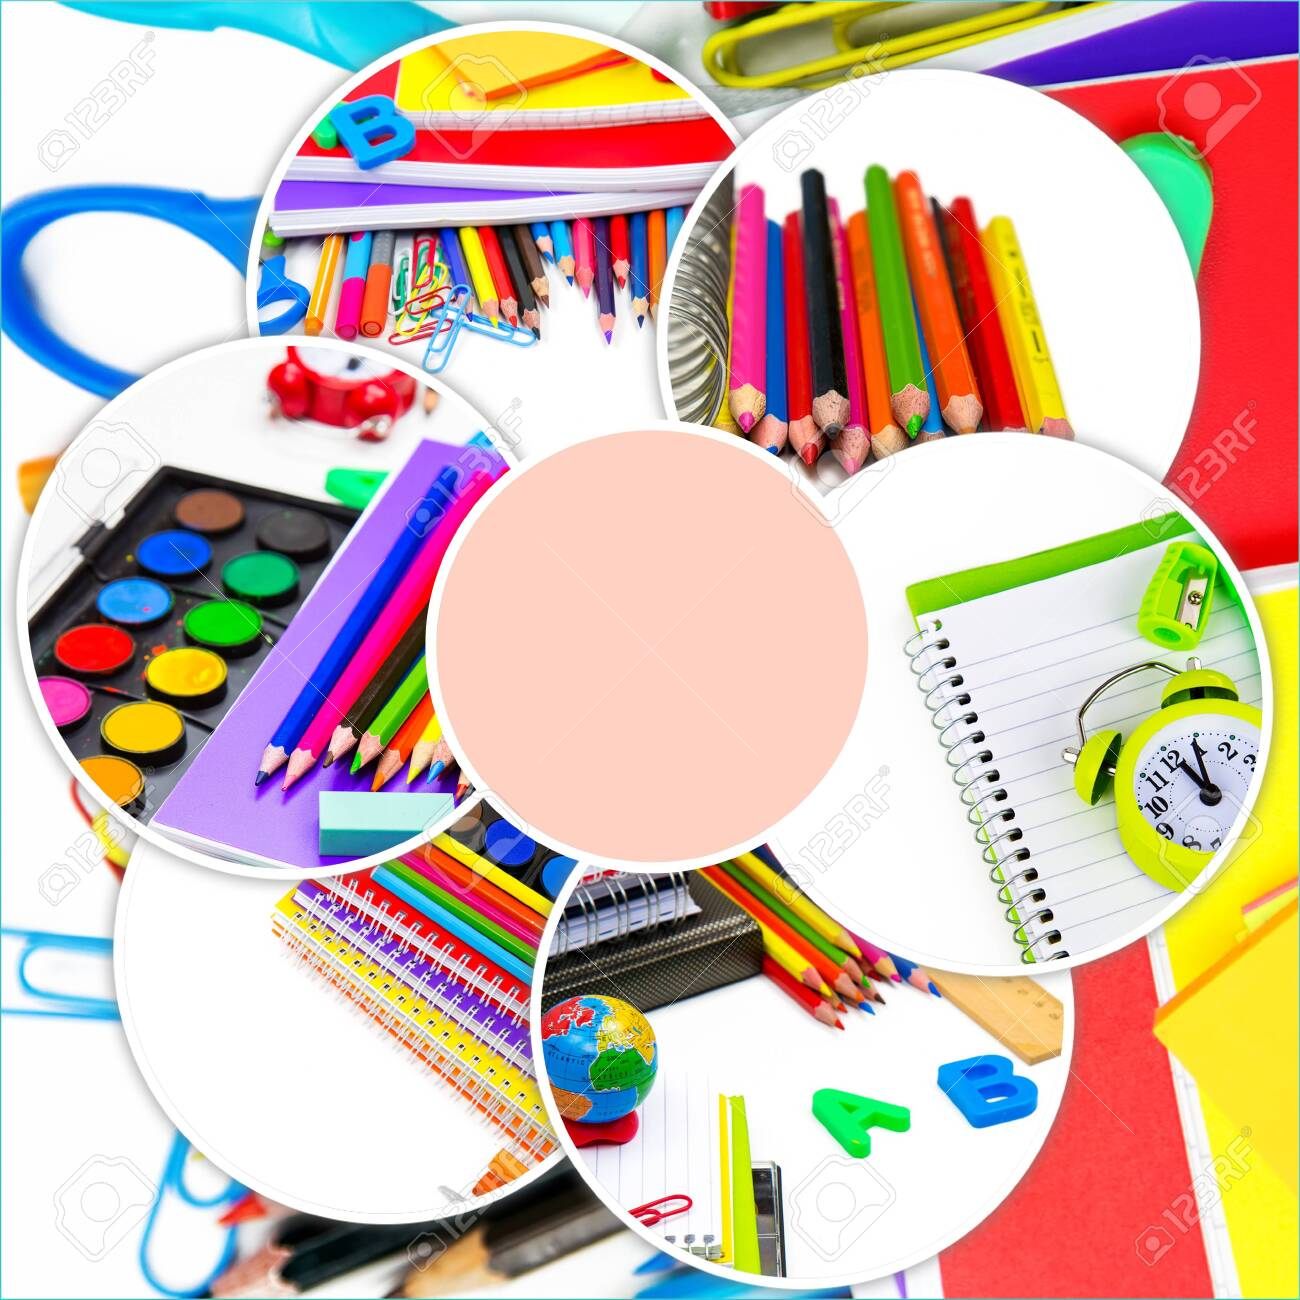 School Education Equipment Tools Collage - 152878497